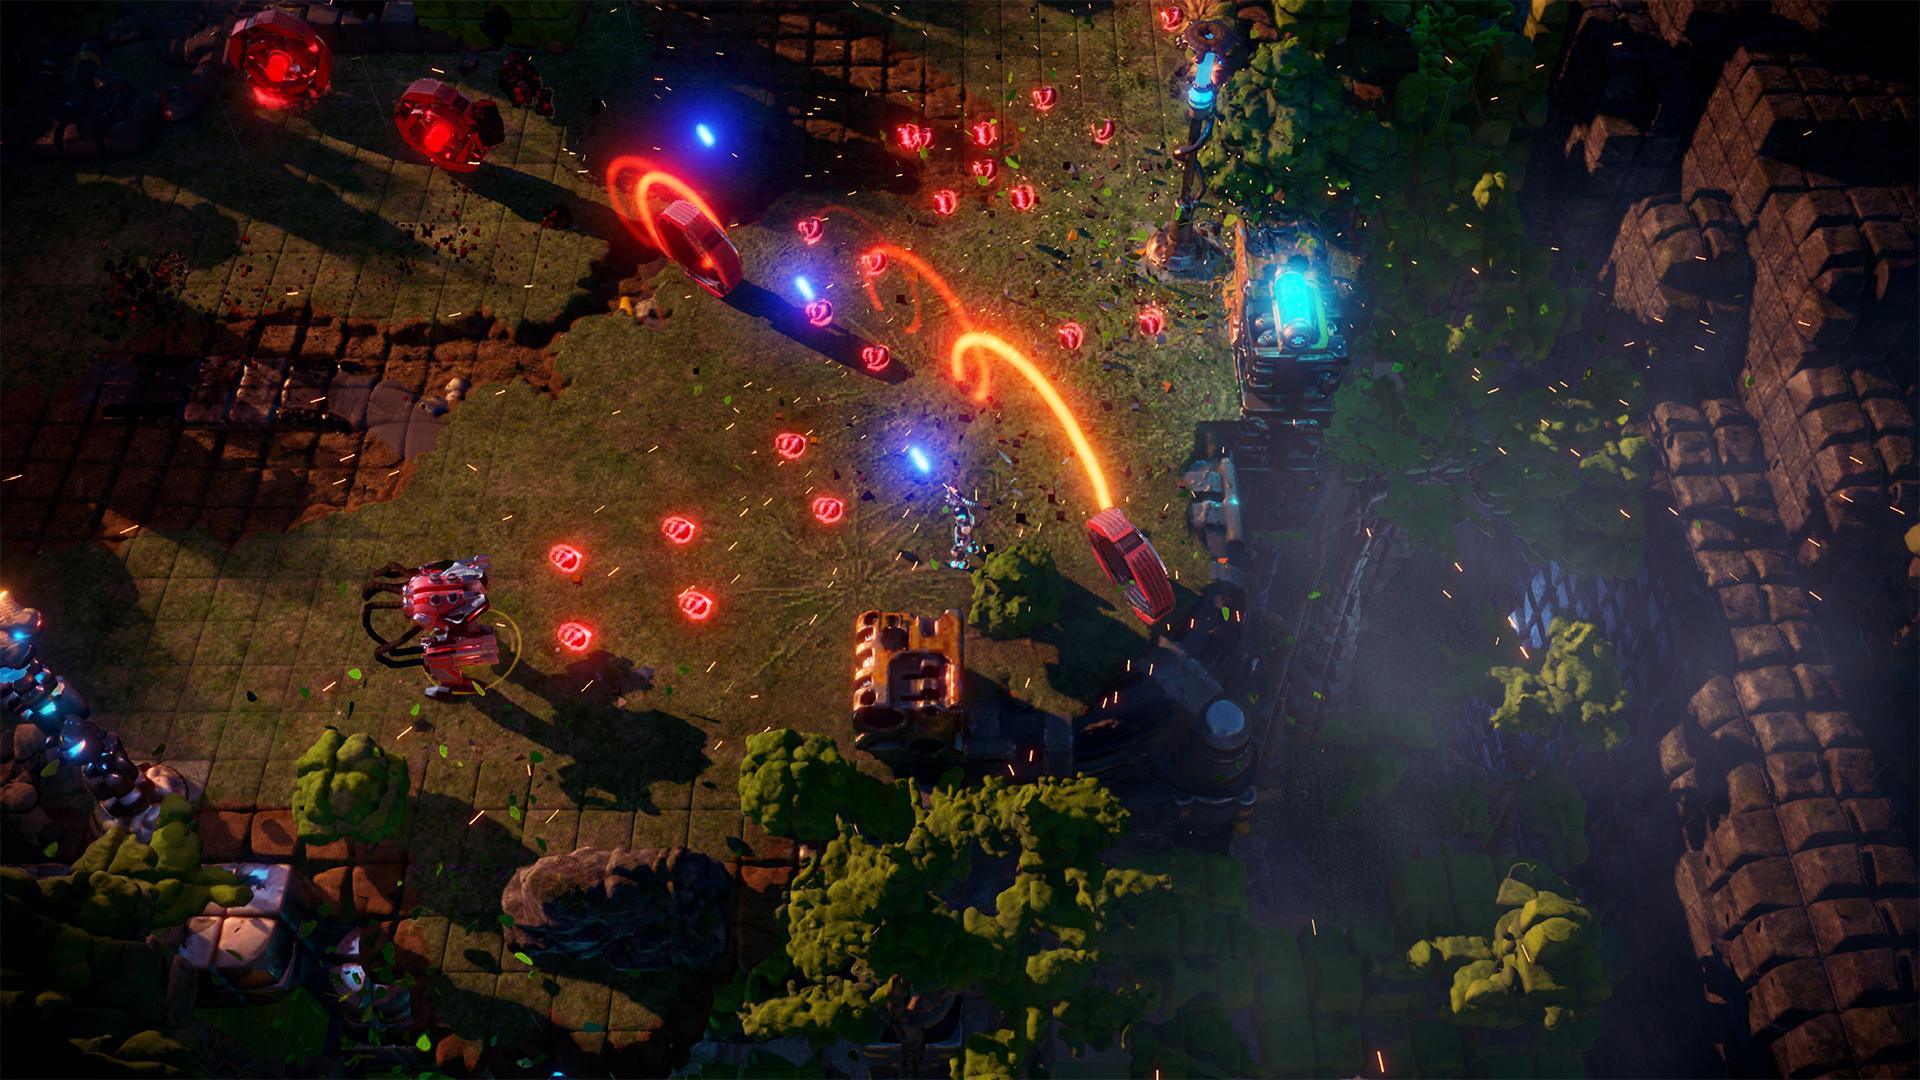 Housemarque's top-down shooter Nex Machina is out June 20 screenshot